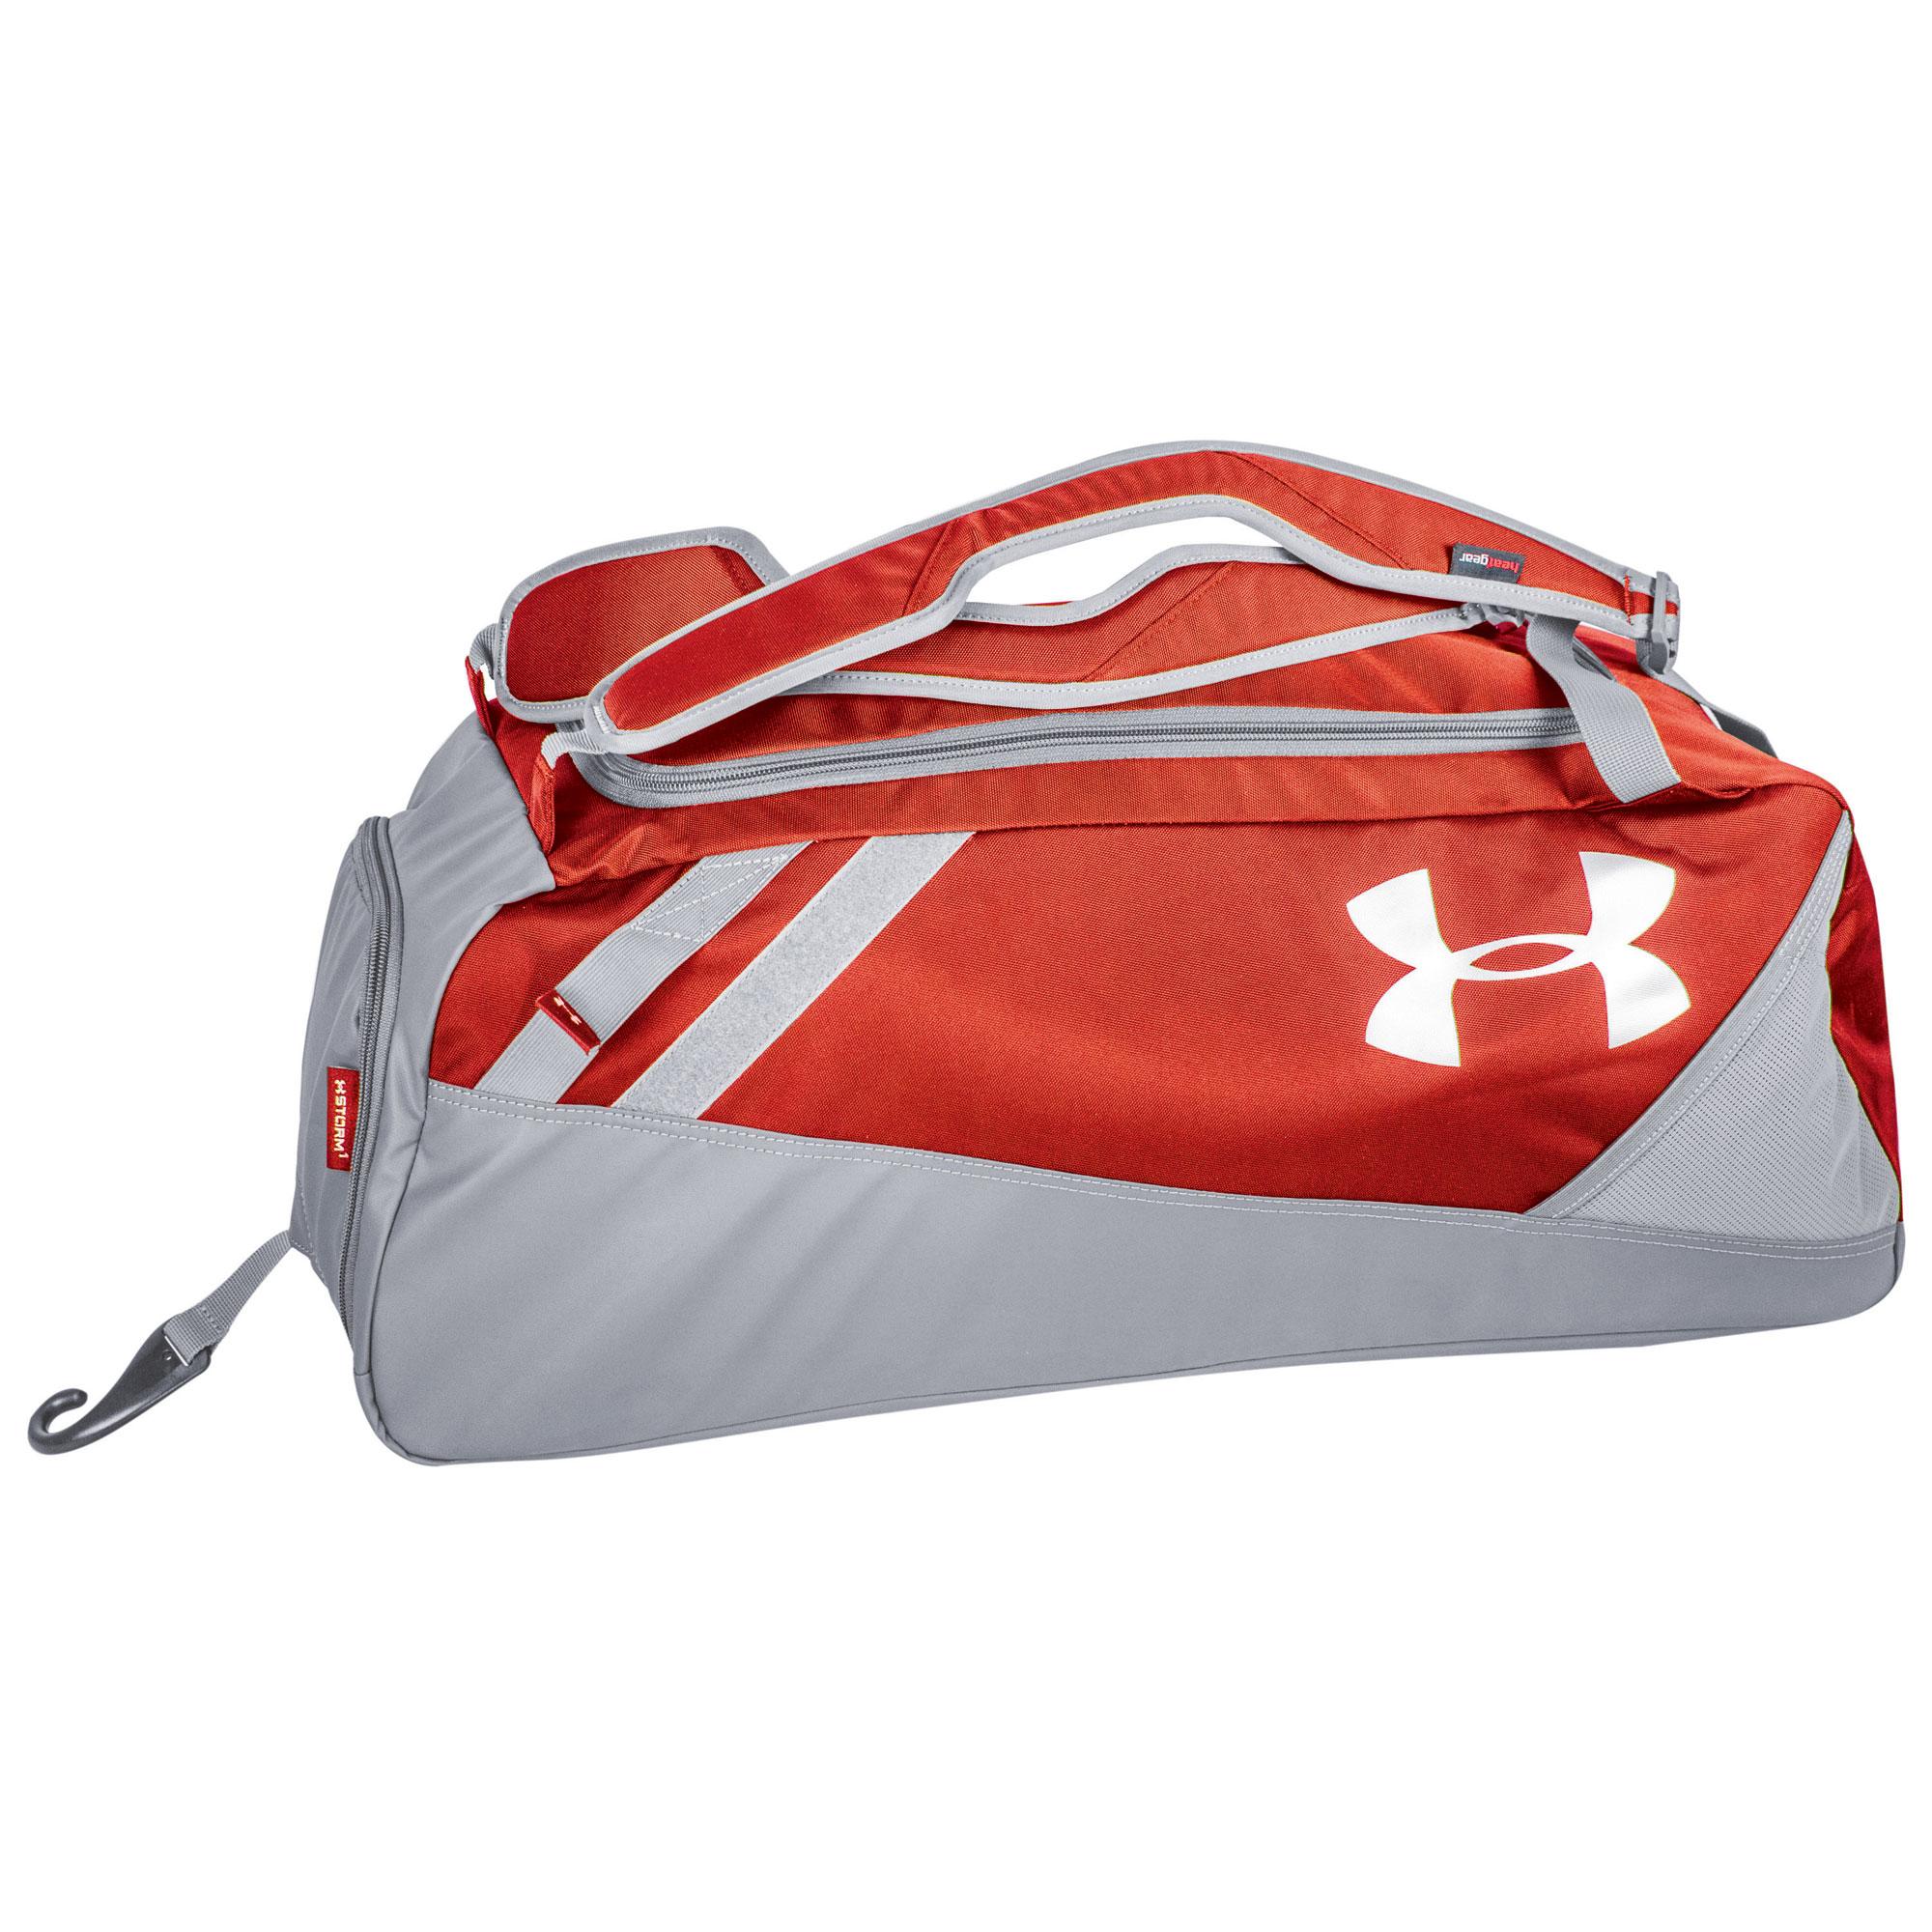 Under Armour Converge Mid-Size Baseball/Softball Backpack/Duffle Bag